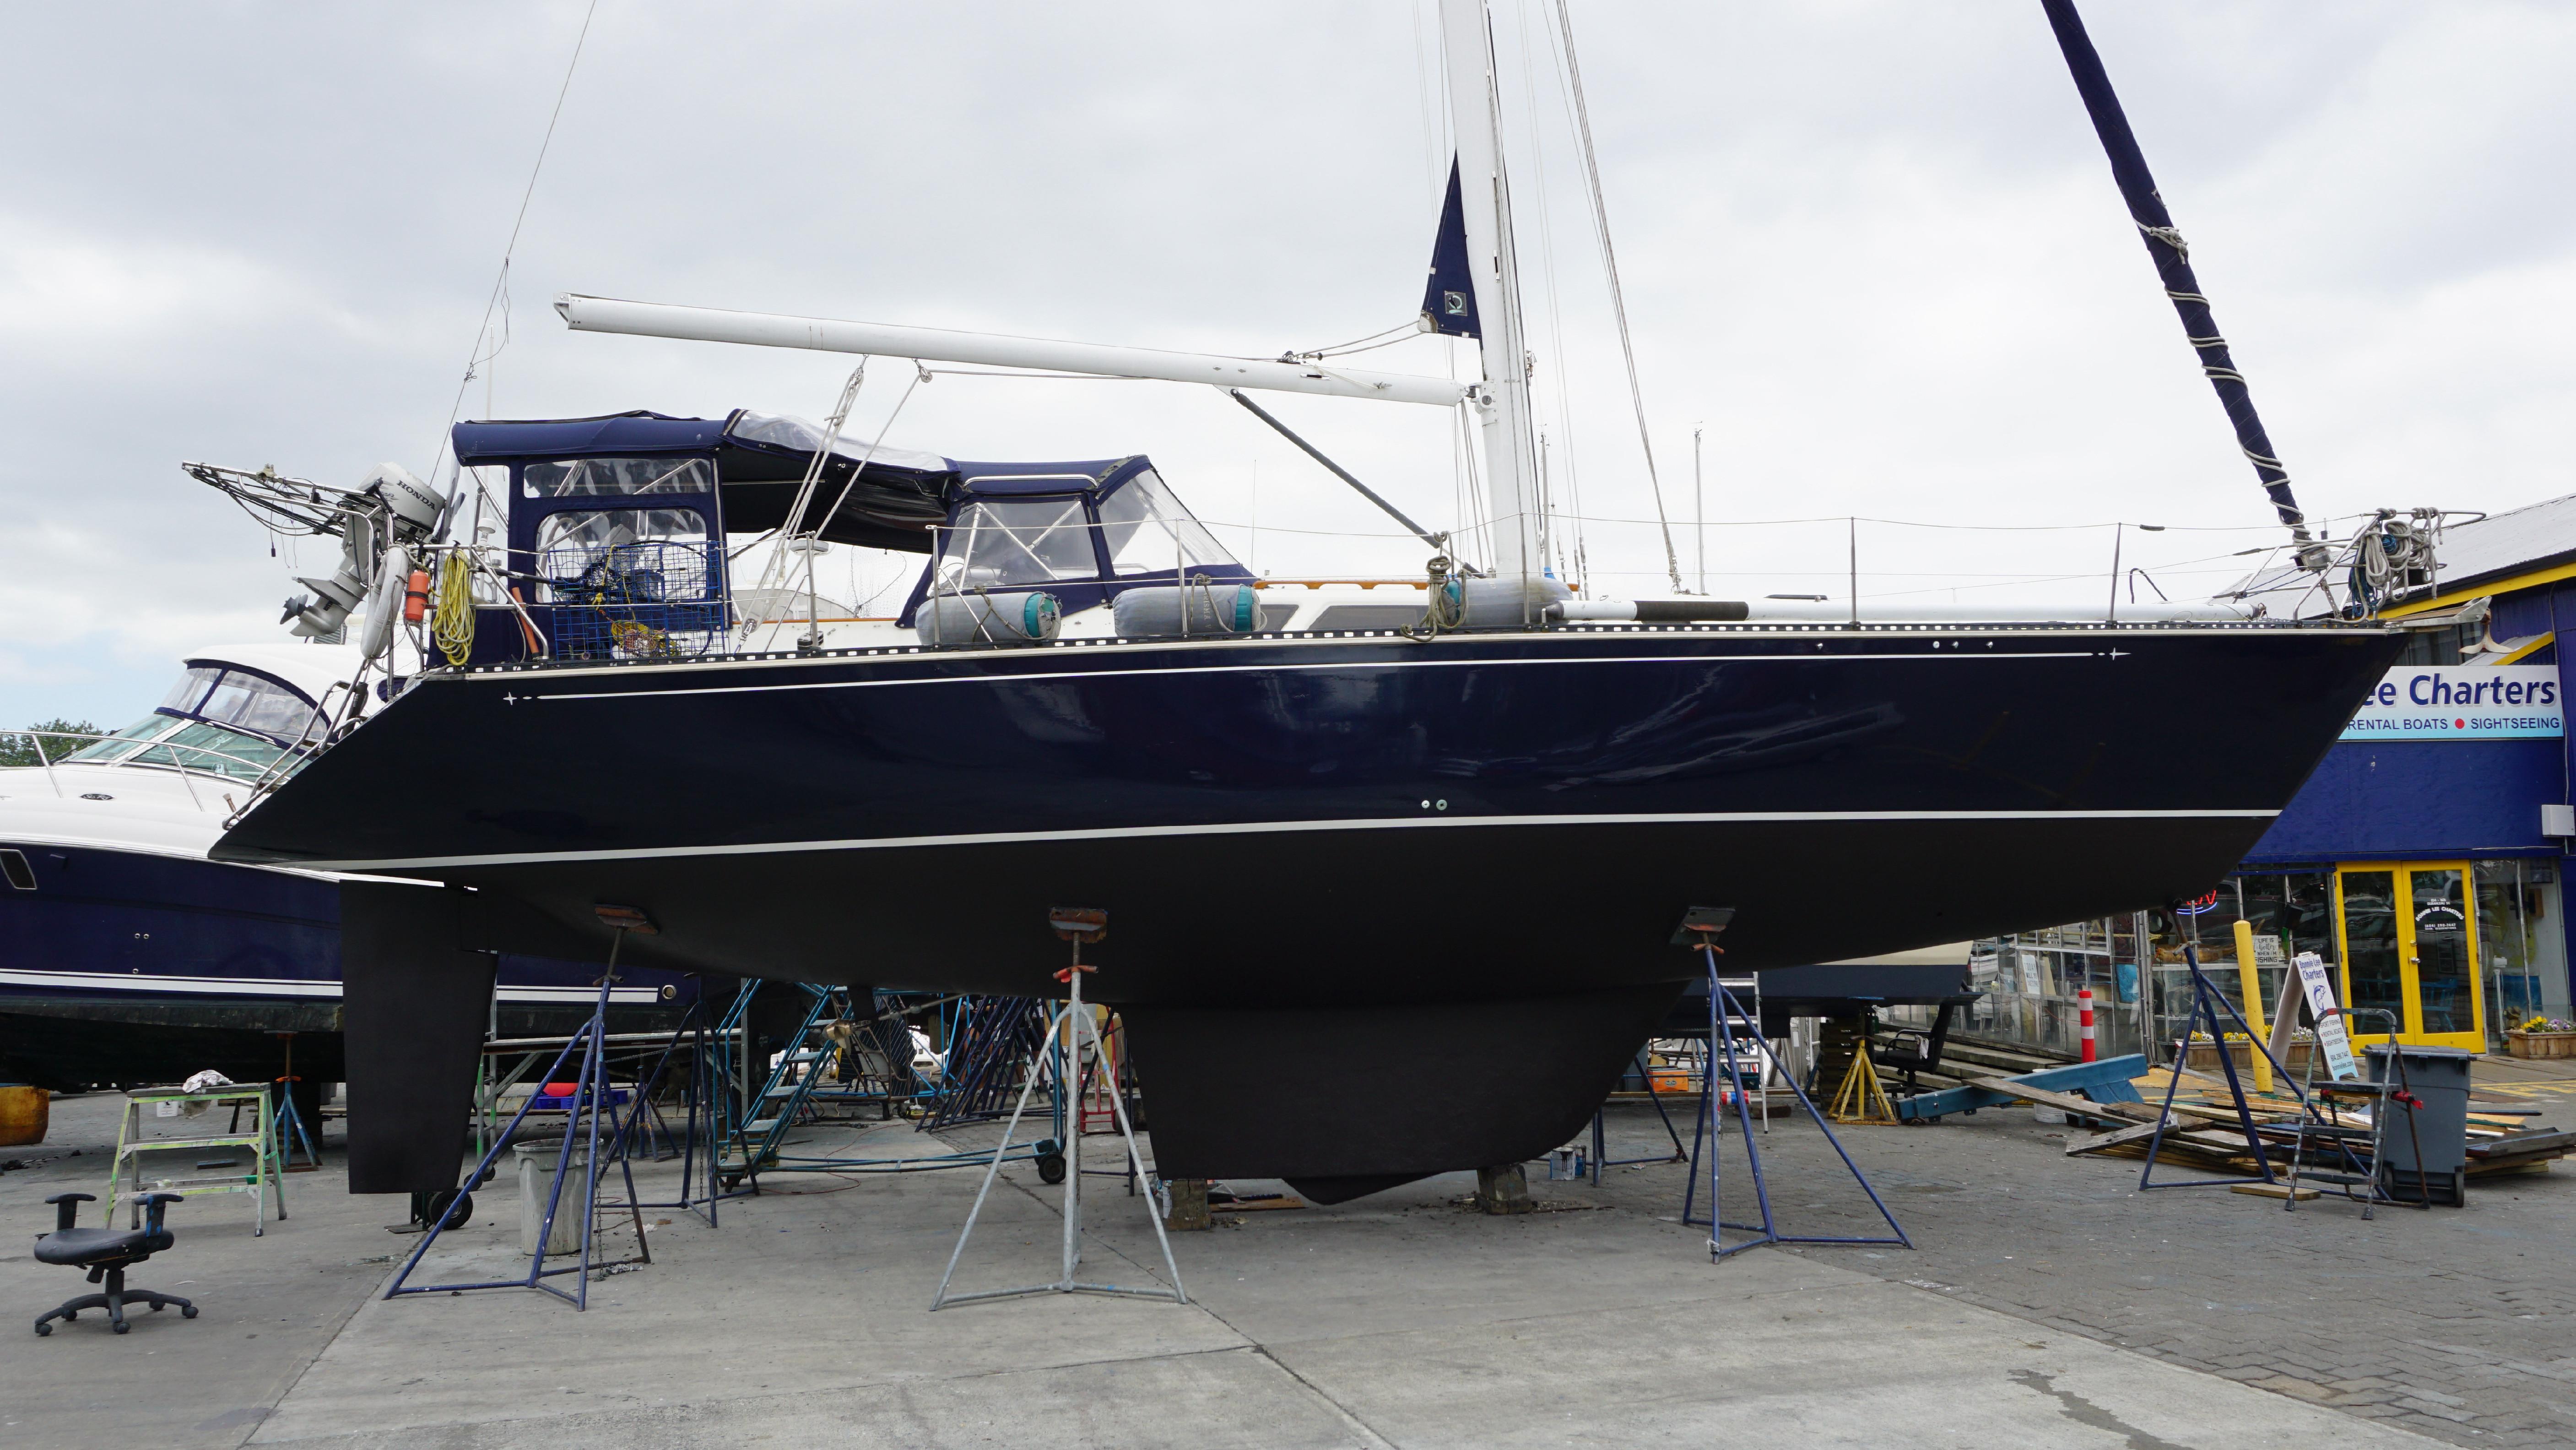 1988 C&C 44, Vancouver British Columbia - boats com